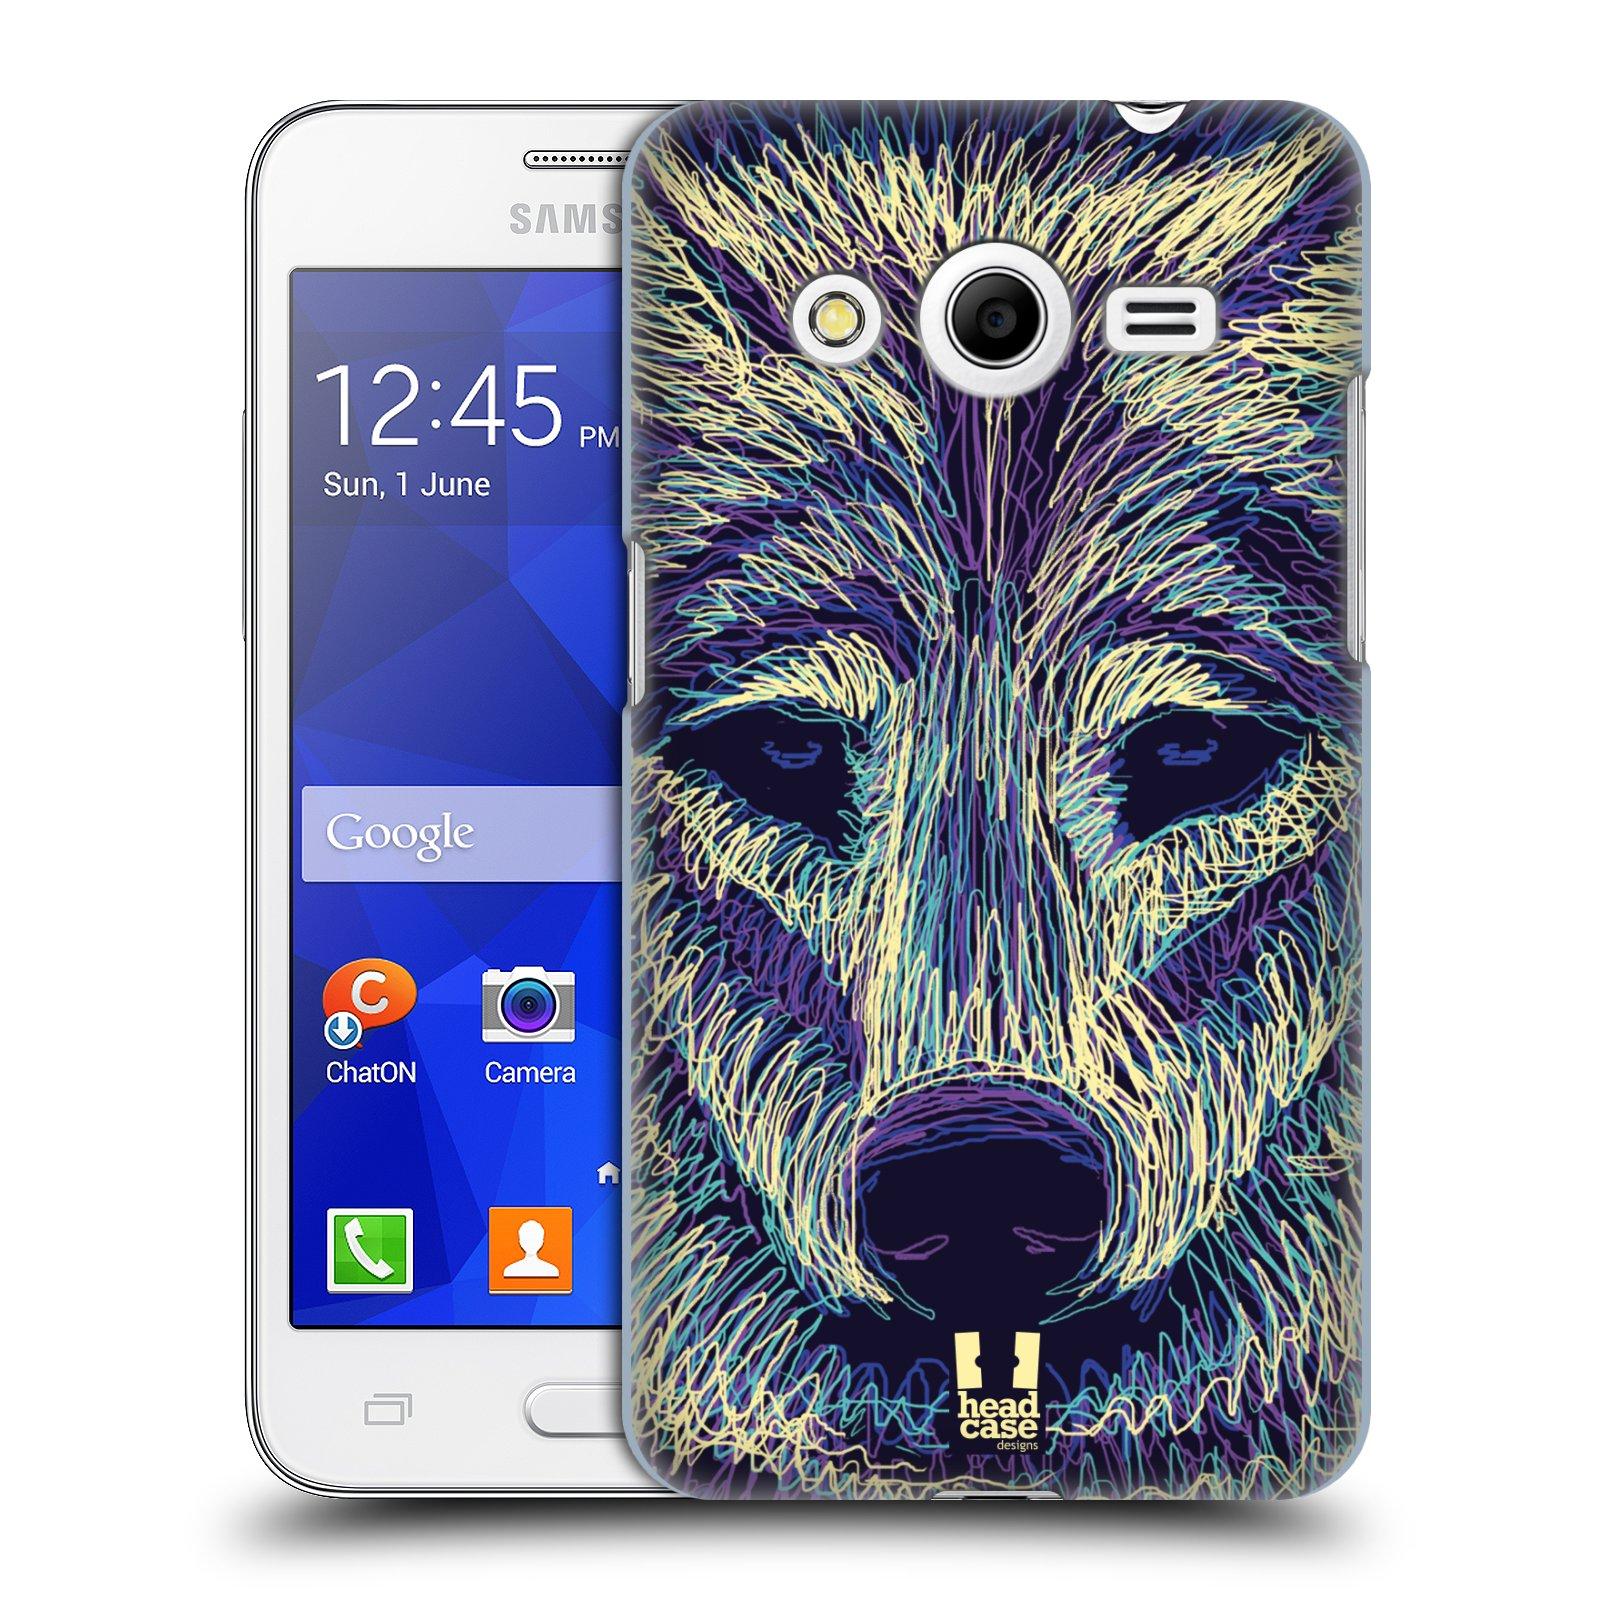 HEAD CASE plastový obal na mobil SAMSUNG GALAXY Core 2 (G355H) vzor zvíře čmáranice vlk